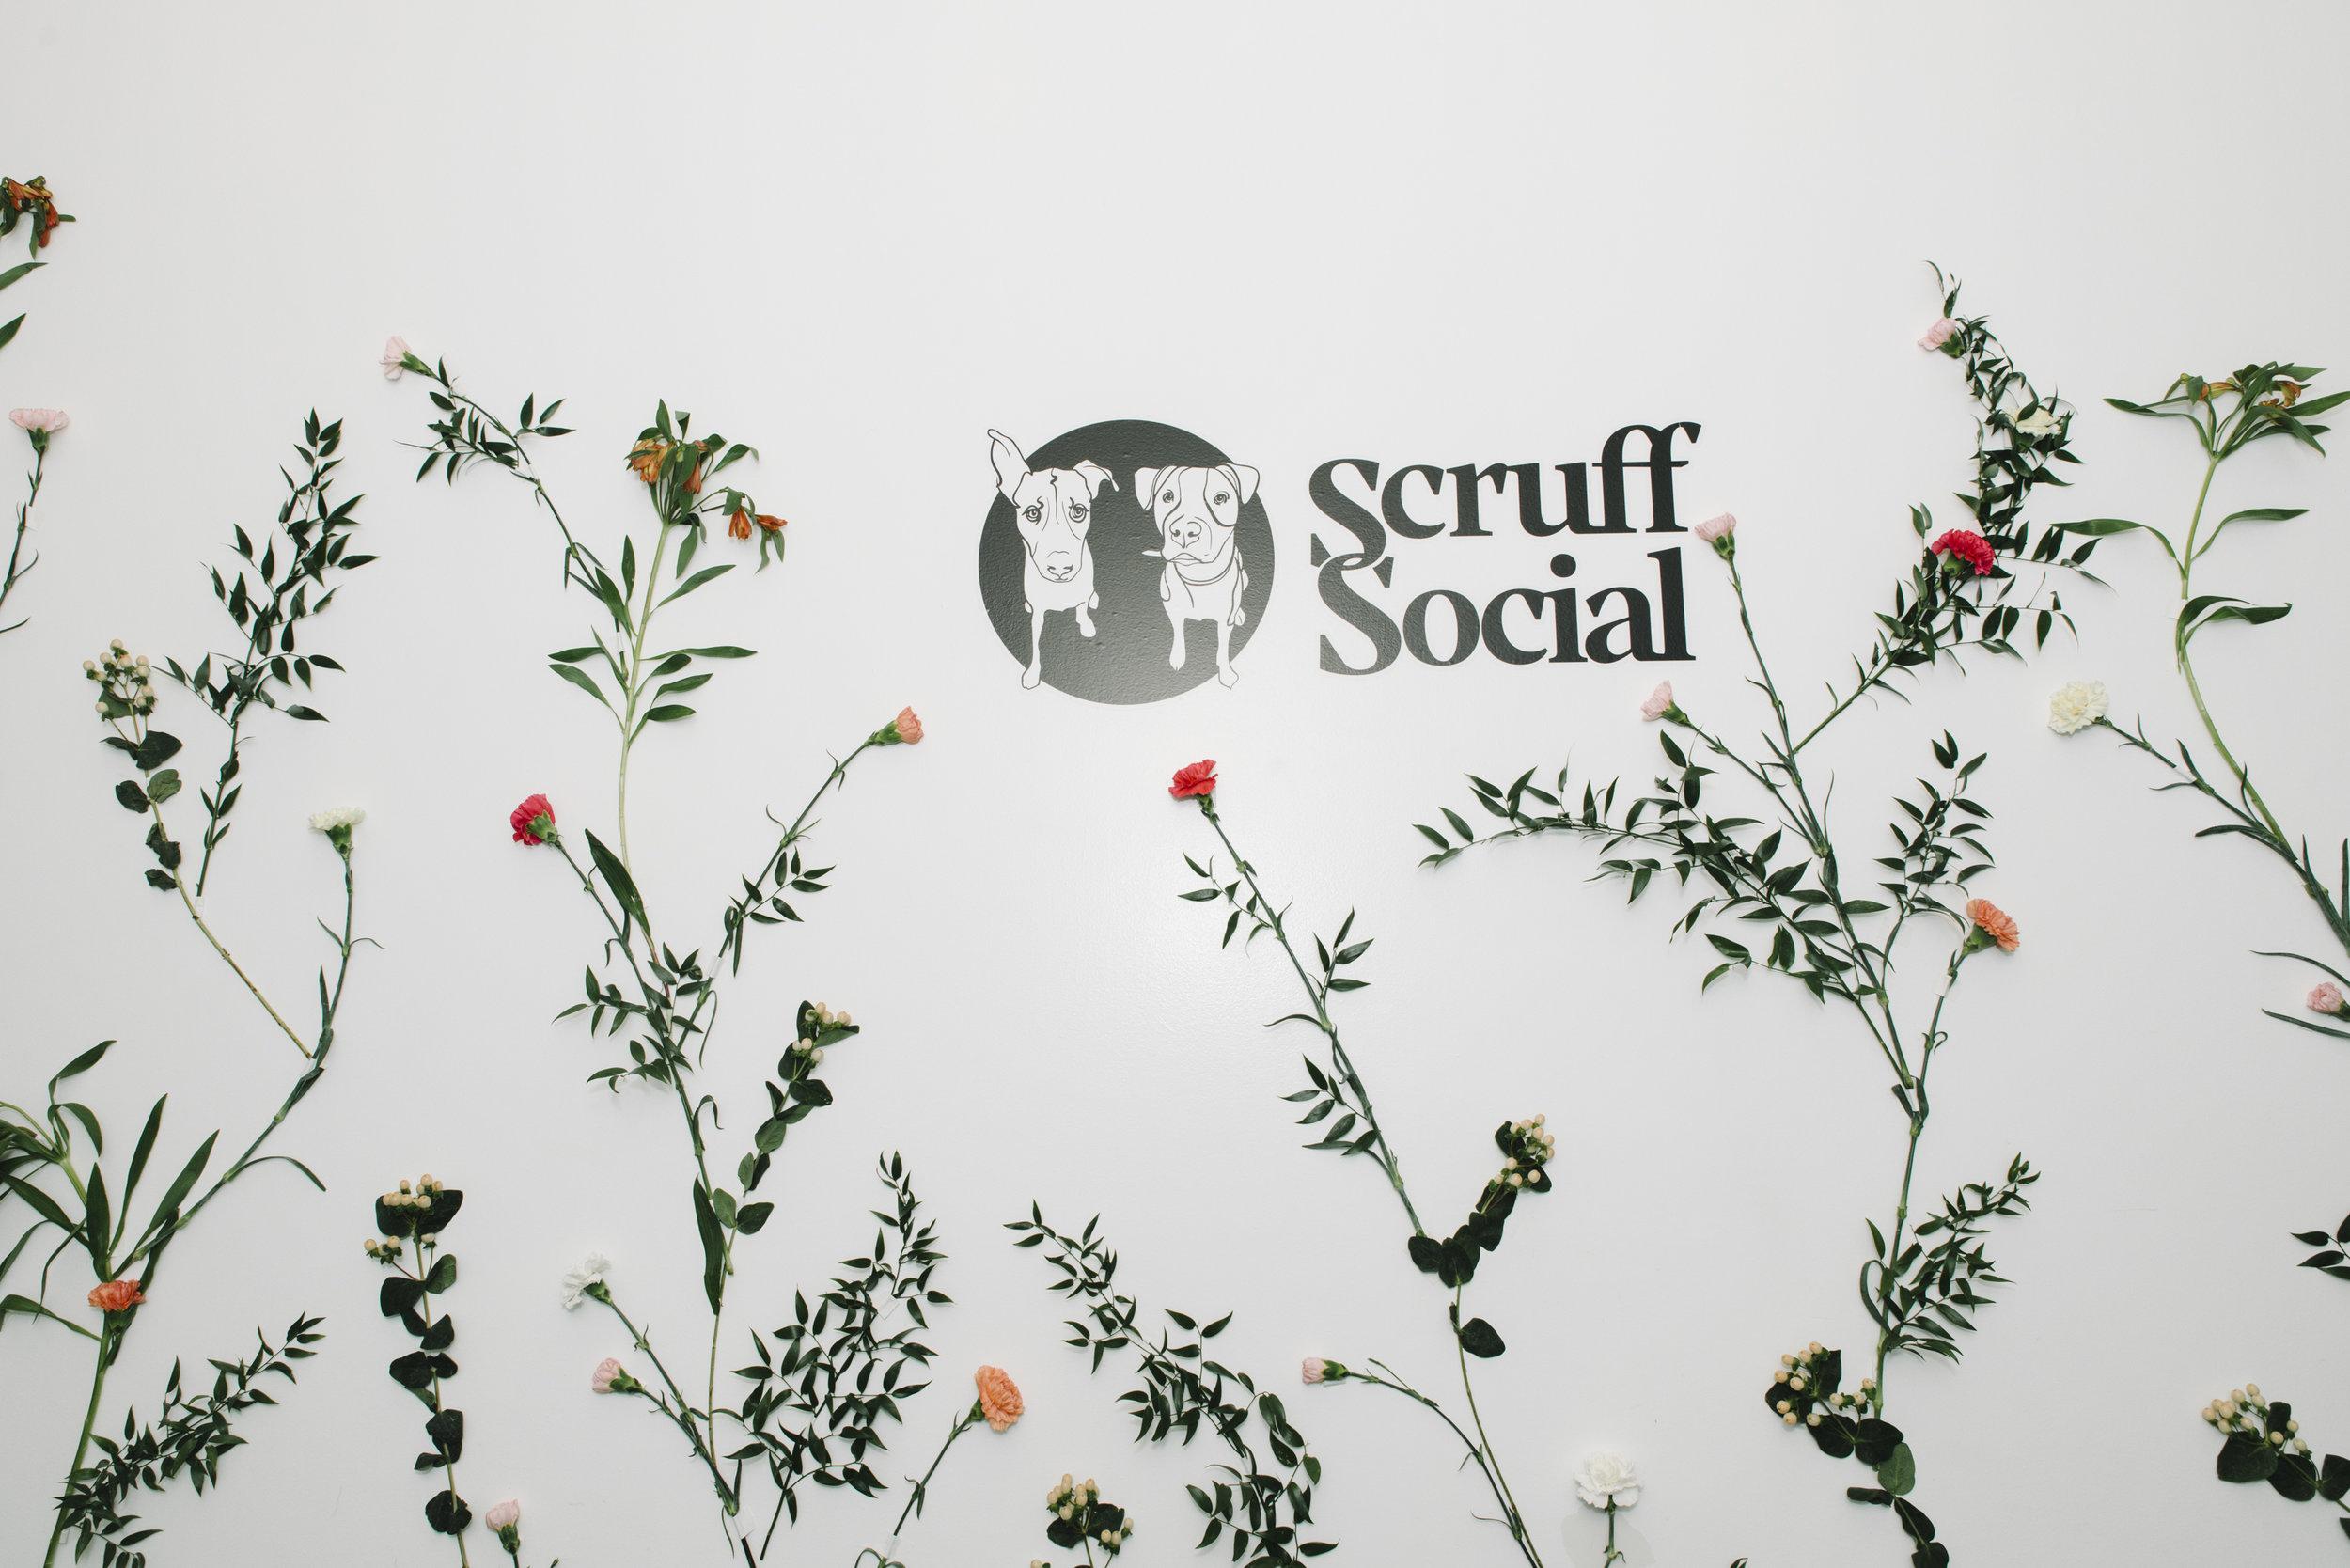 StefEthan-SaveOurScruff-ScruffSocal-SOS-DogRescue-District28Events-D28-TorontoEventPhotographer-Event-SOSDogRescue-11.JPG